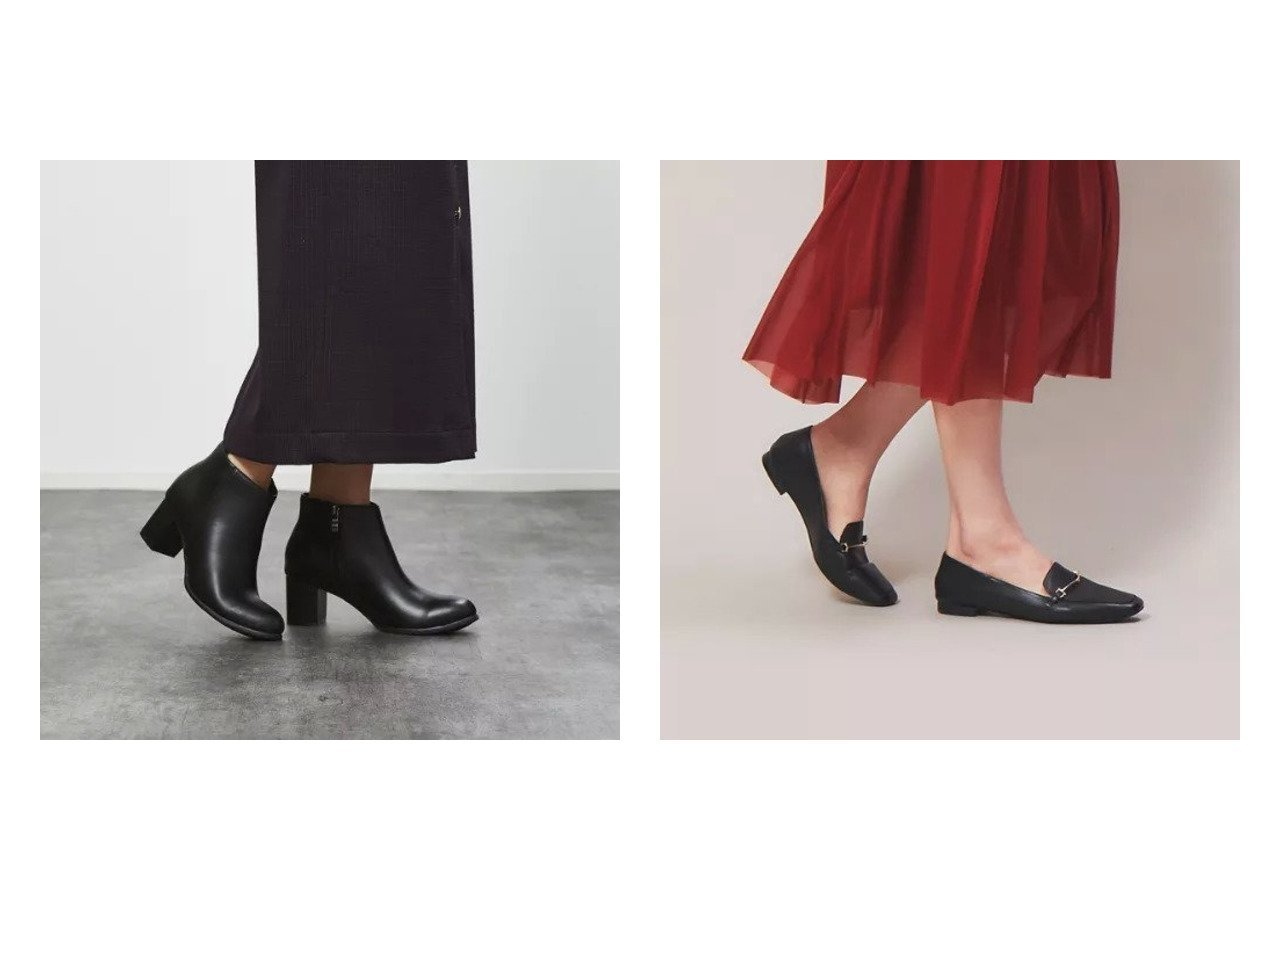 【Piche Abahouse/ピシェ アバハウス】の【完全防水】チャンキーヒールレインブーツ&【急遽追加生産決定!】バブーシュビットモカスクエアシューズ シューズ・靴のおすすめ!人気、トレンド・レディースファッションの通販  おすすめで人気の流行・トレンド、ファッションの通販商品 メンズファッション・キッズファッション・インテリア・家具・レディースファッション・服の通販 founy(ファニー) https://founy.com/ ファッション Fashion レディースファッション WOMEN インソール シューズ ライニング シェイプ フォルム フラット モチーフ 人気 今季 春 Spring 楽ちん |ID:crp329100000010841